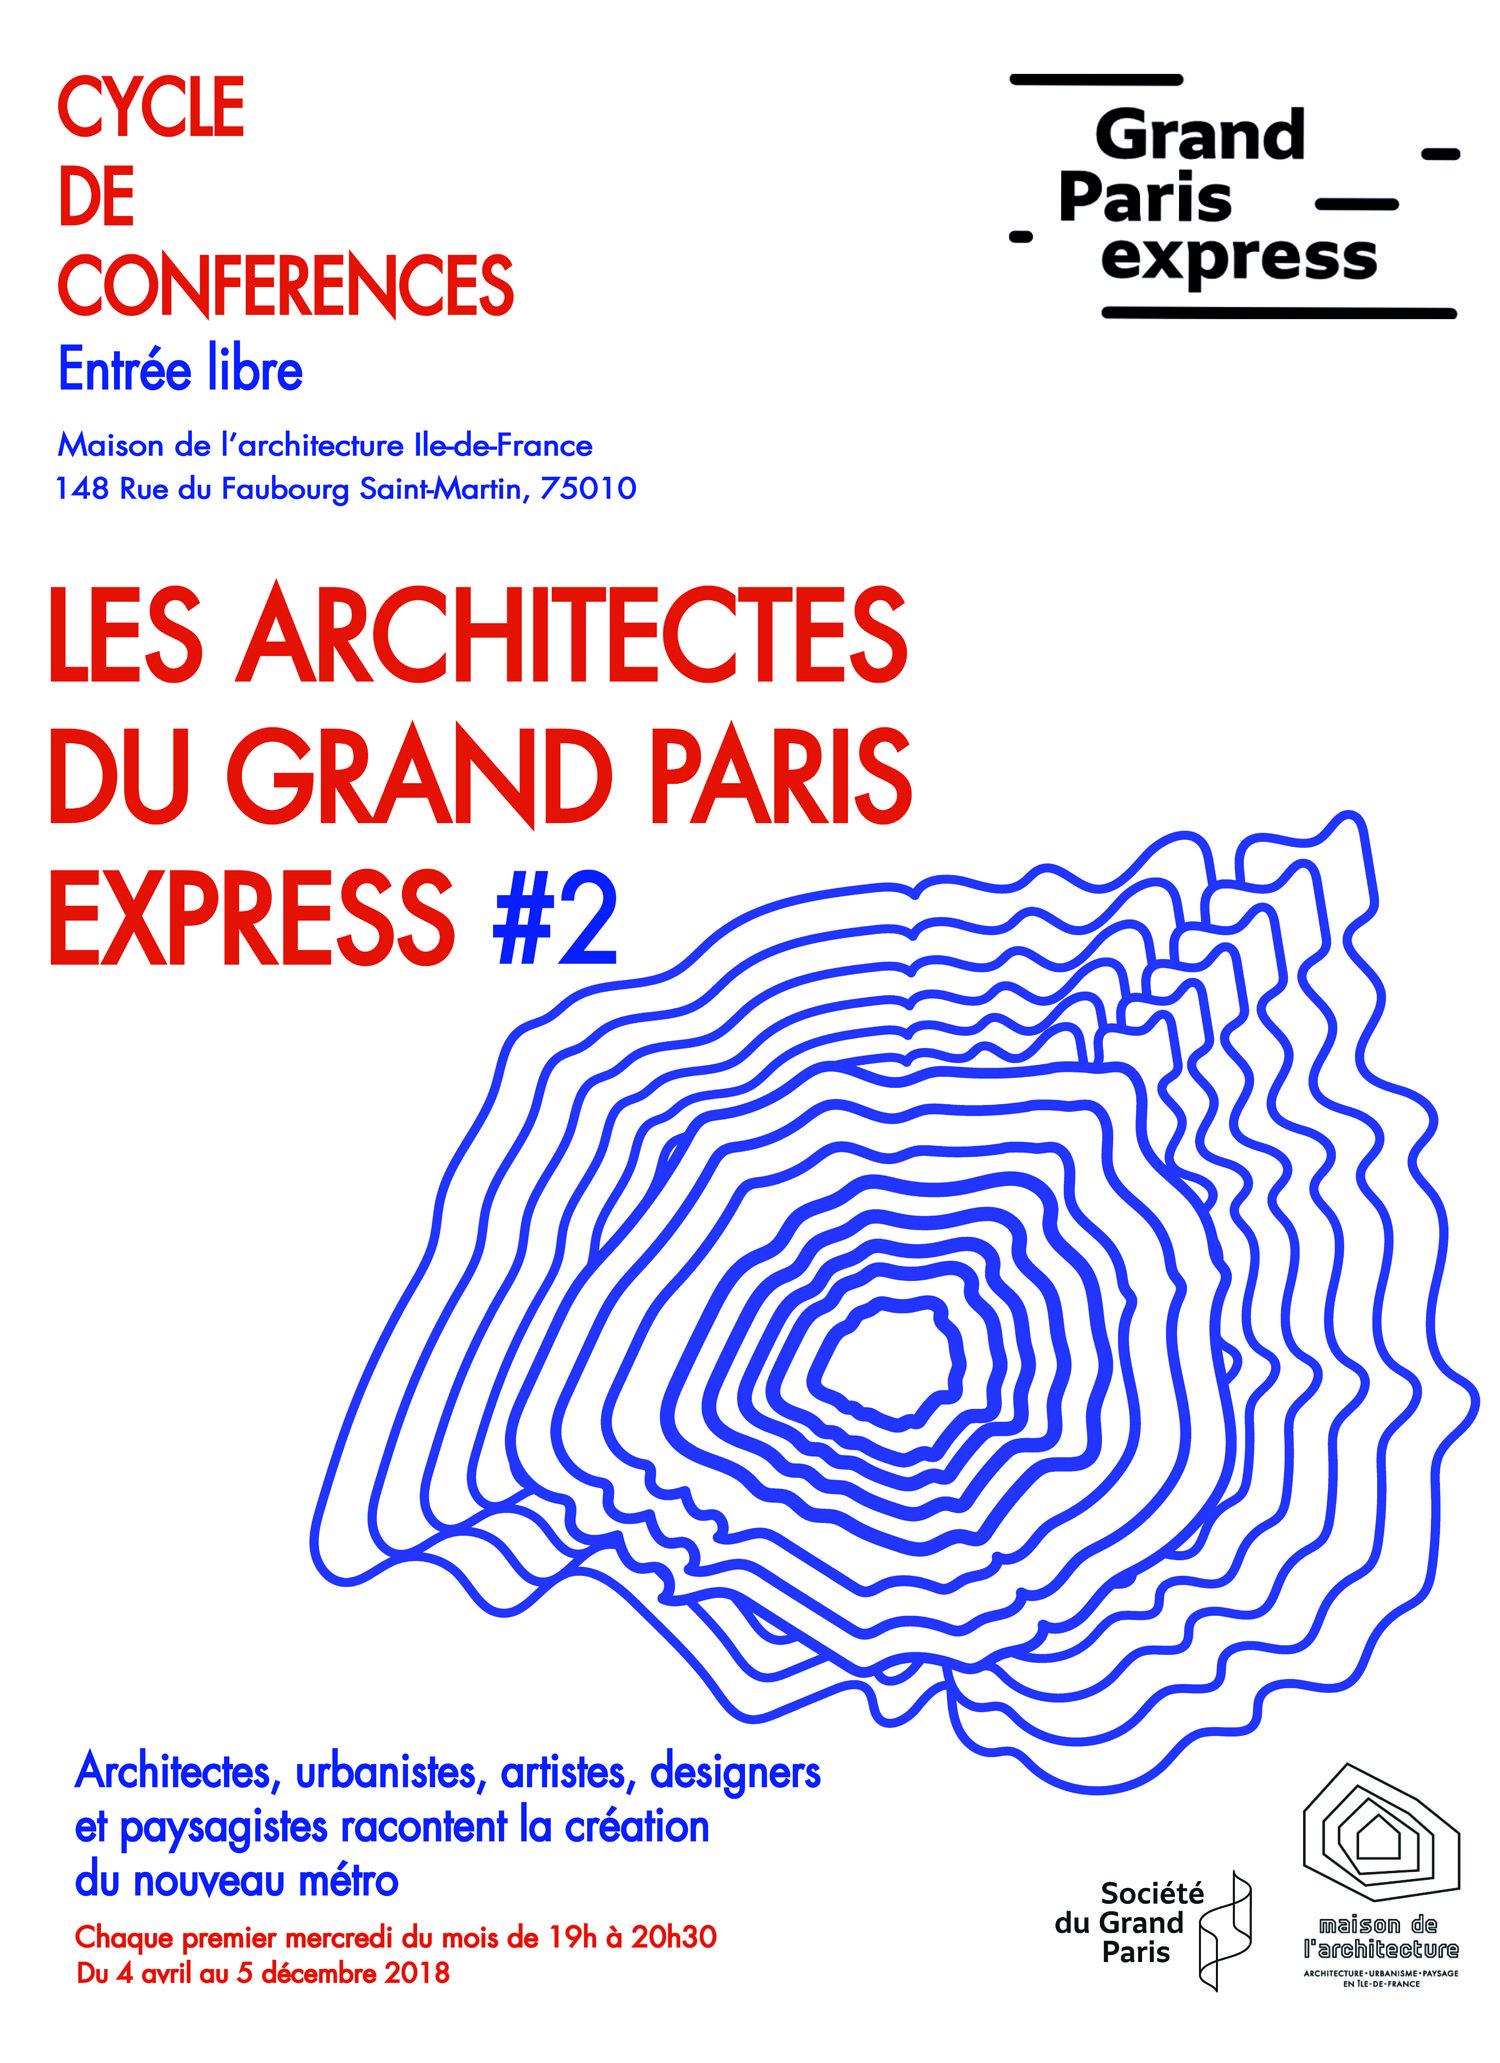 architectes-grand-paris-express.jpg